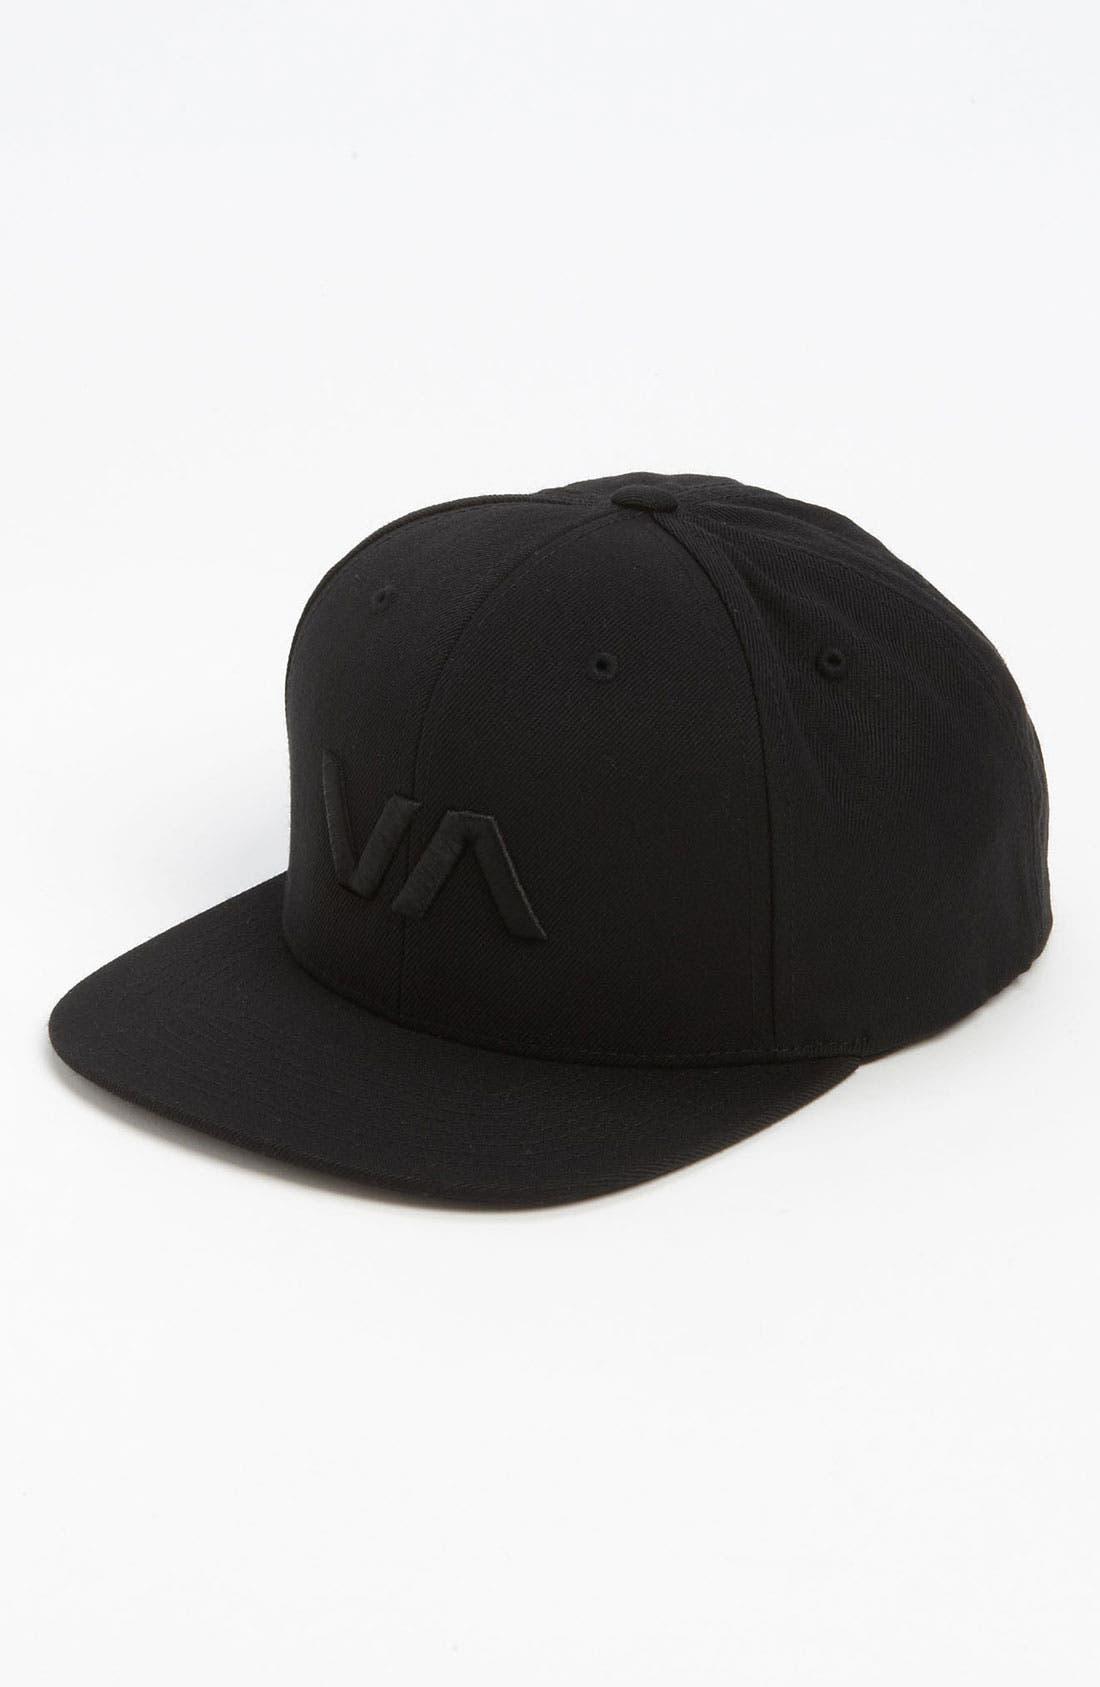 Alternate Image 1 Selected - RVCA 'VA Starter' Snapback Baseball Cap